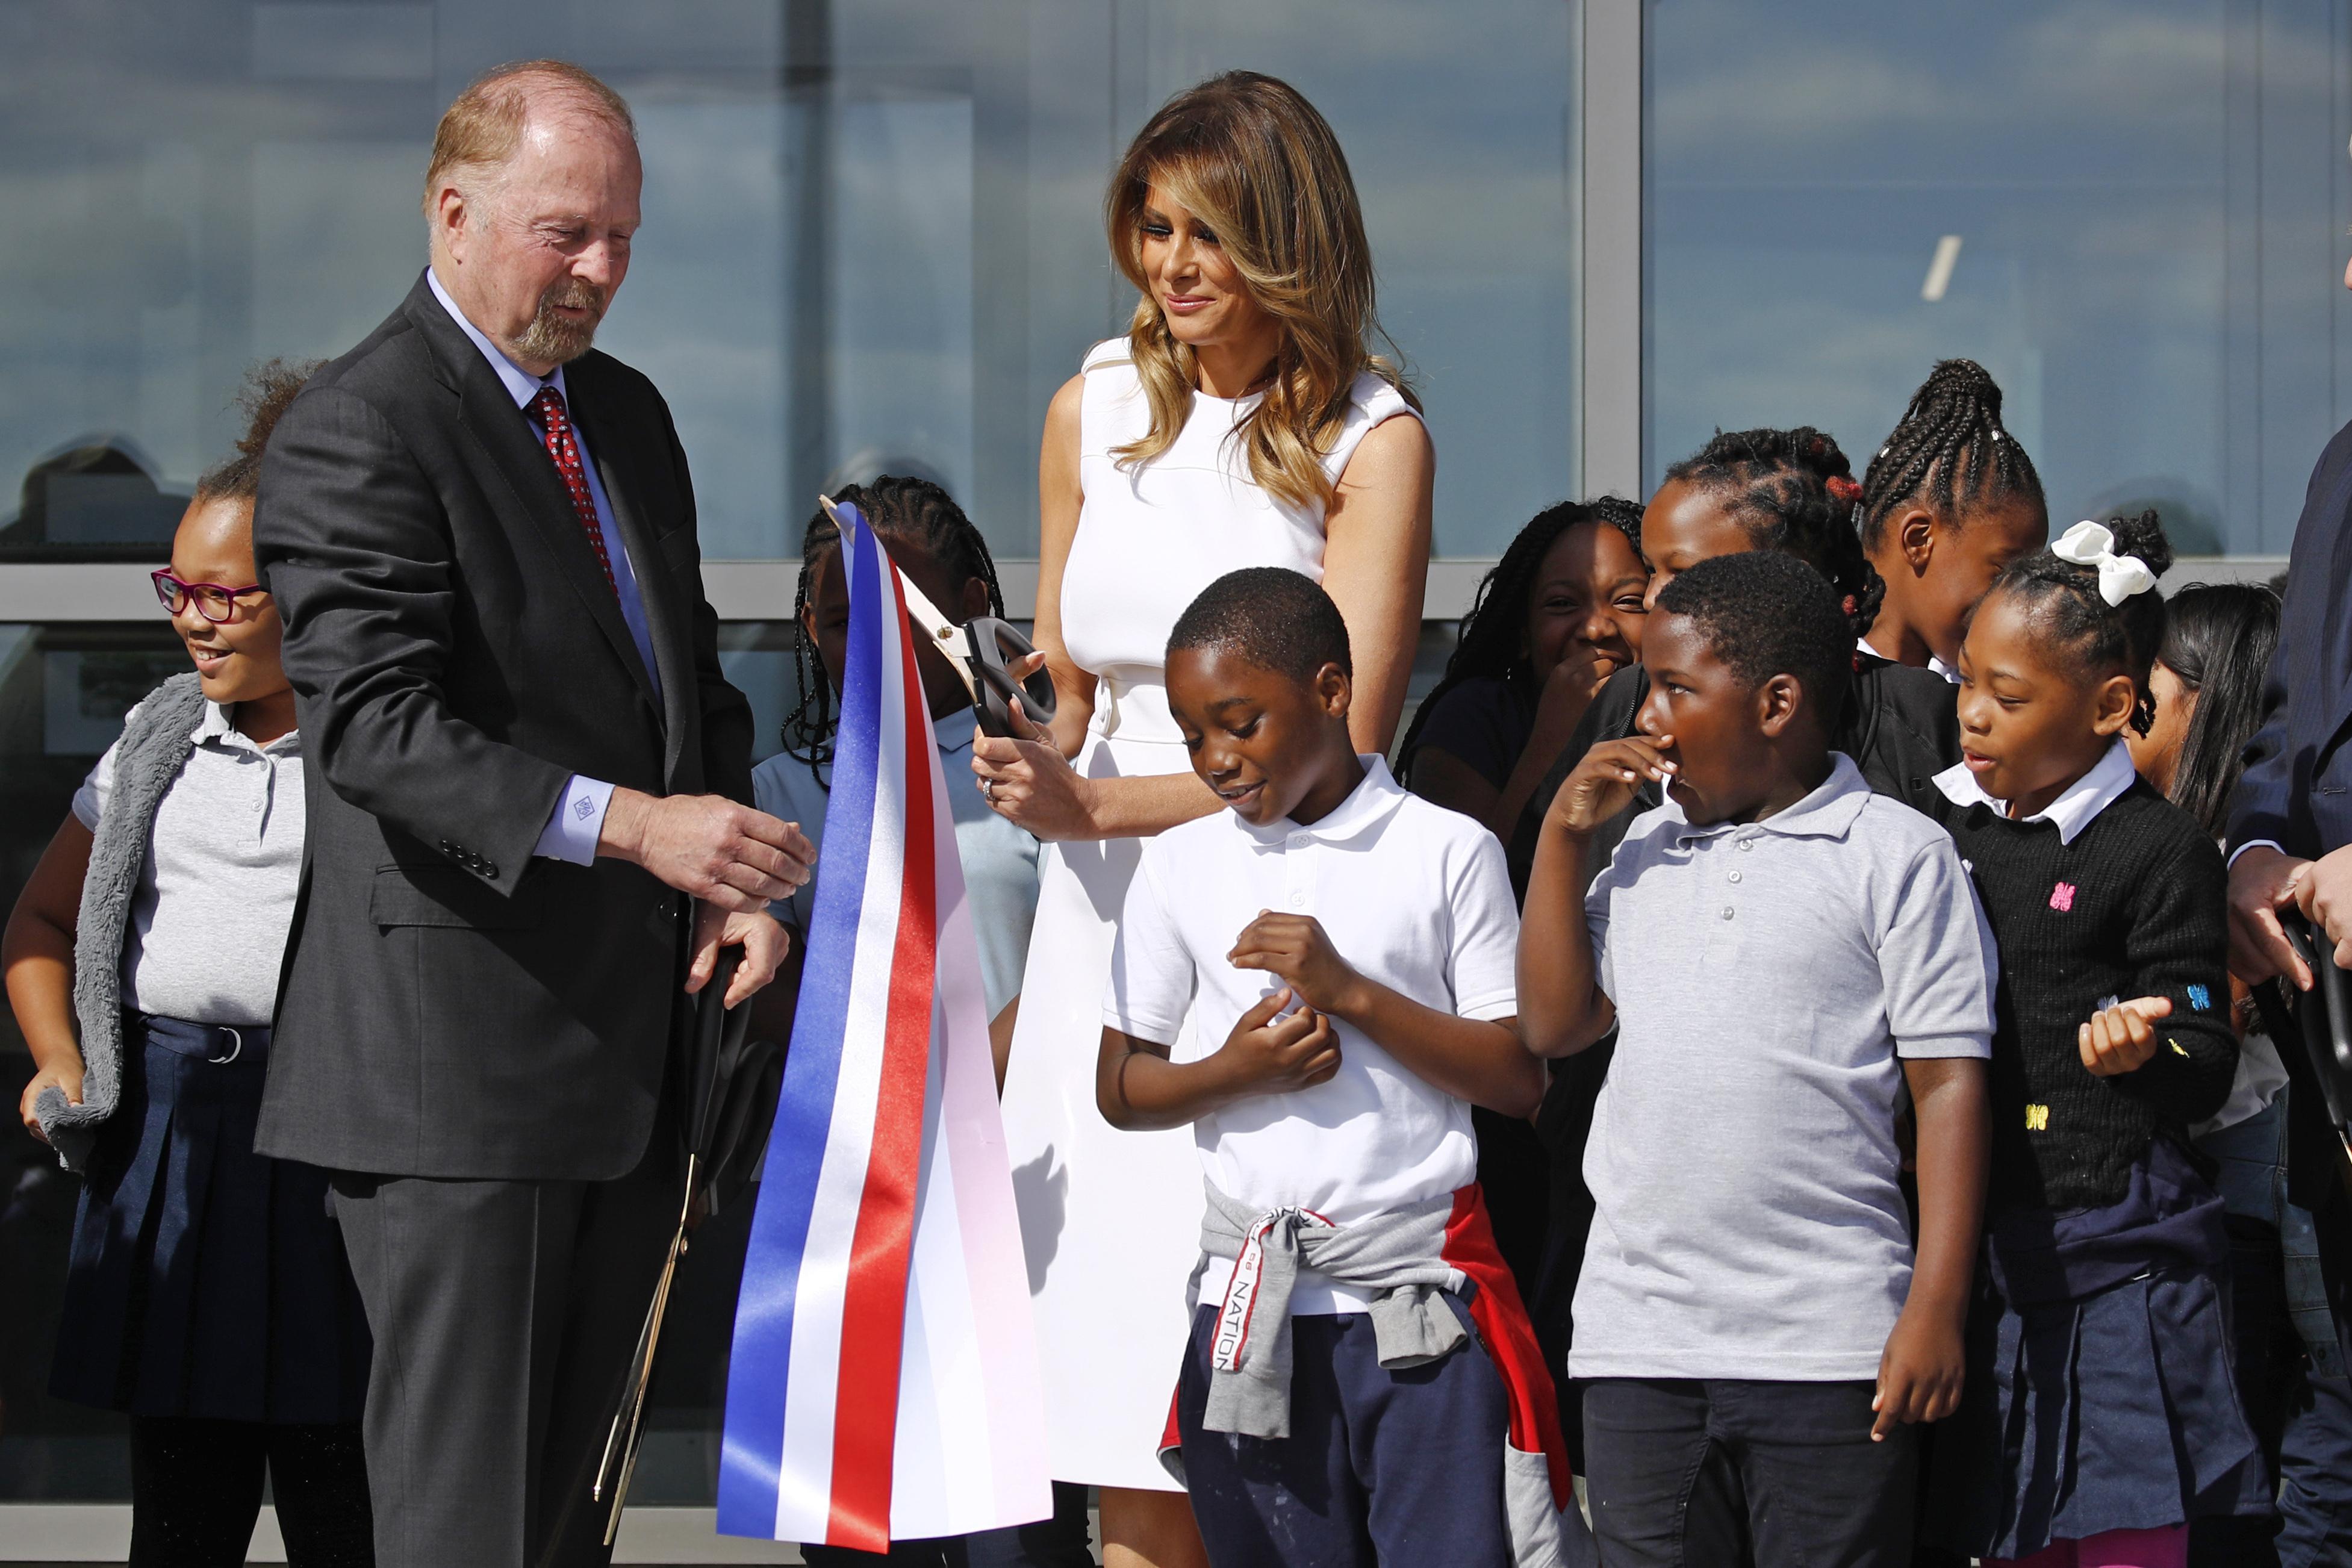 Washington Monument reopens with Melania Trump ribbon cutting